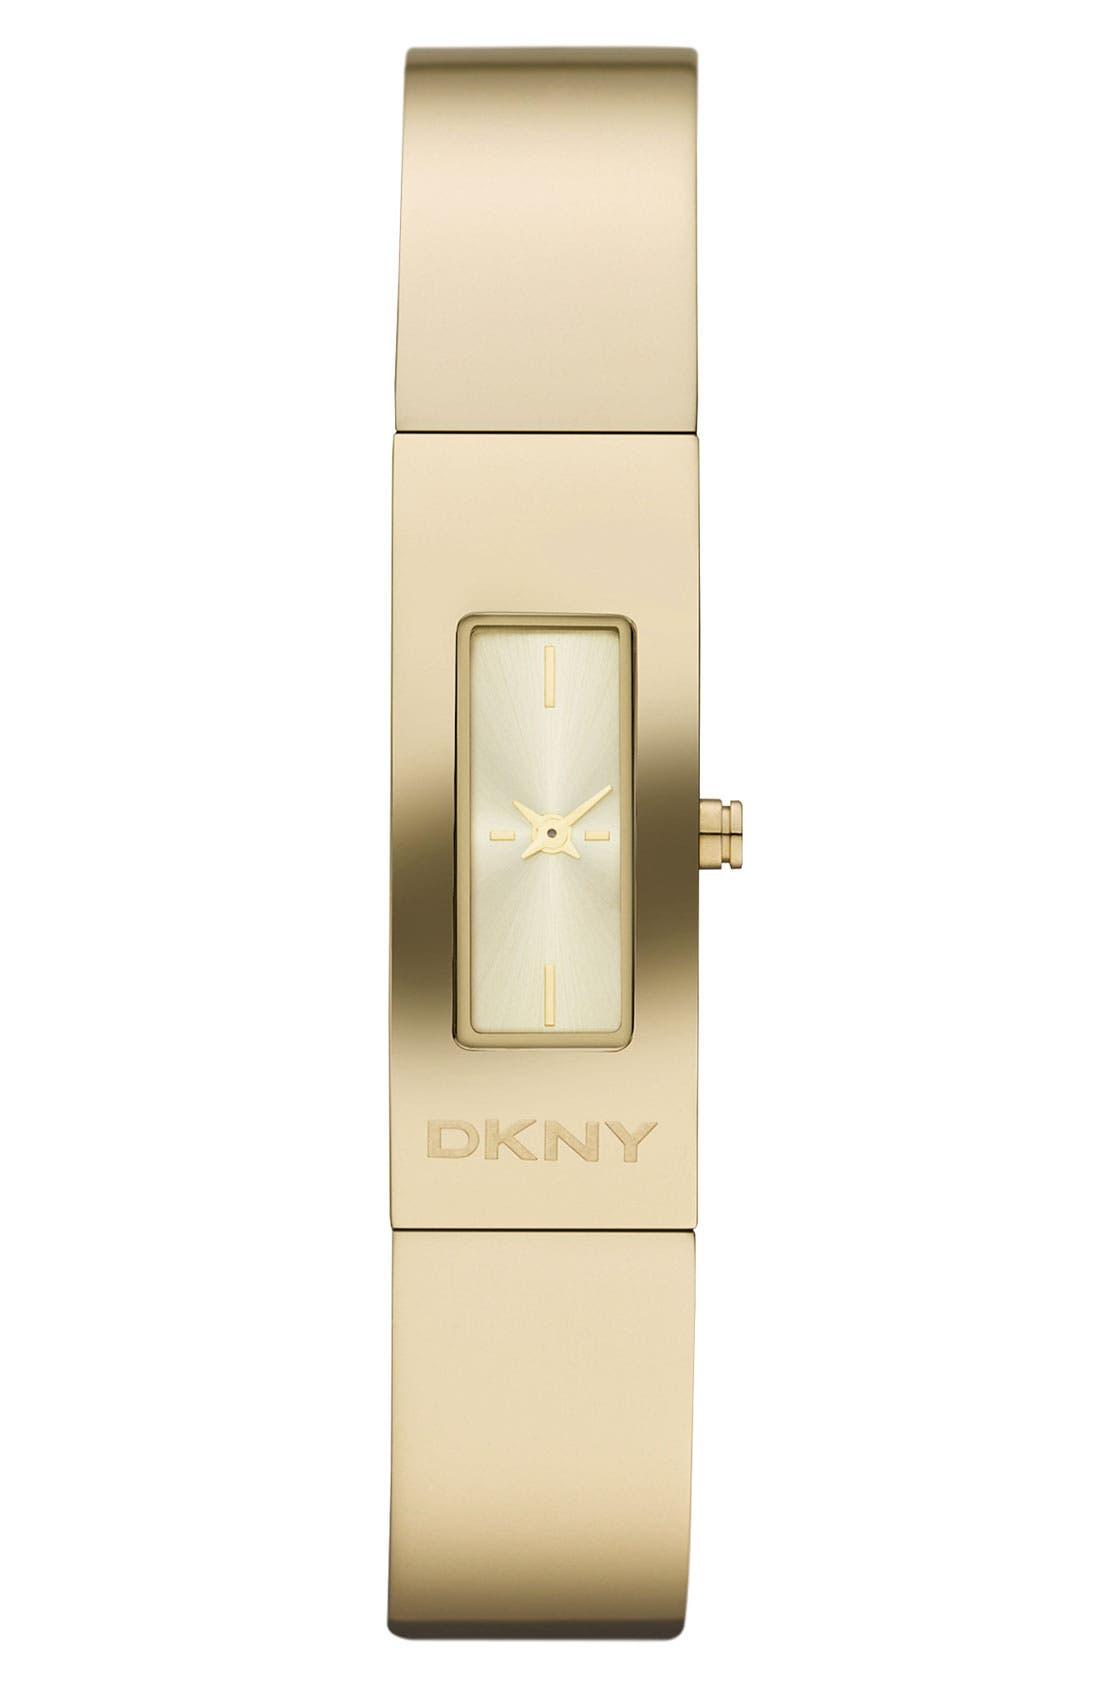 Alternate Image 1 Selected - DKNY 'Beekman' Logo Bangle Watch, 13mm x 33mm